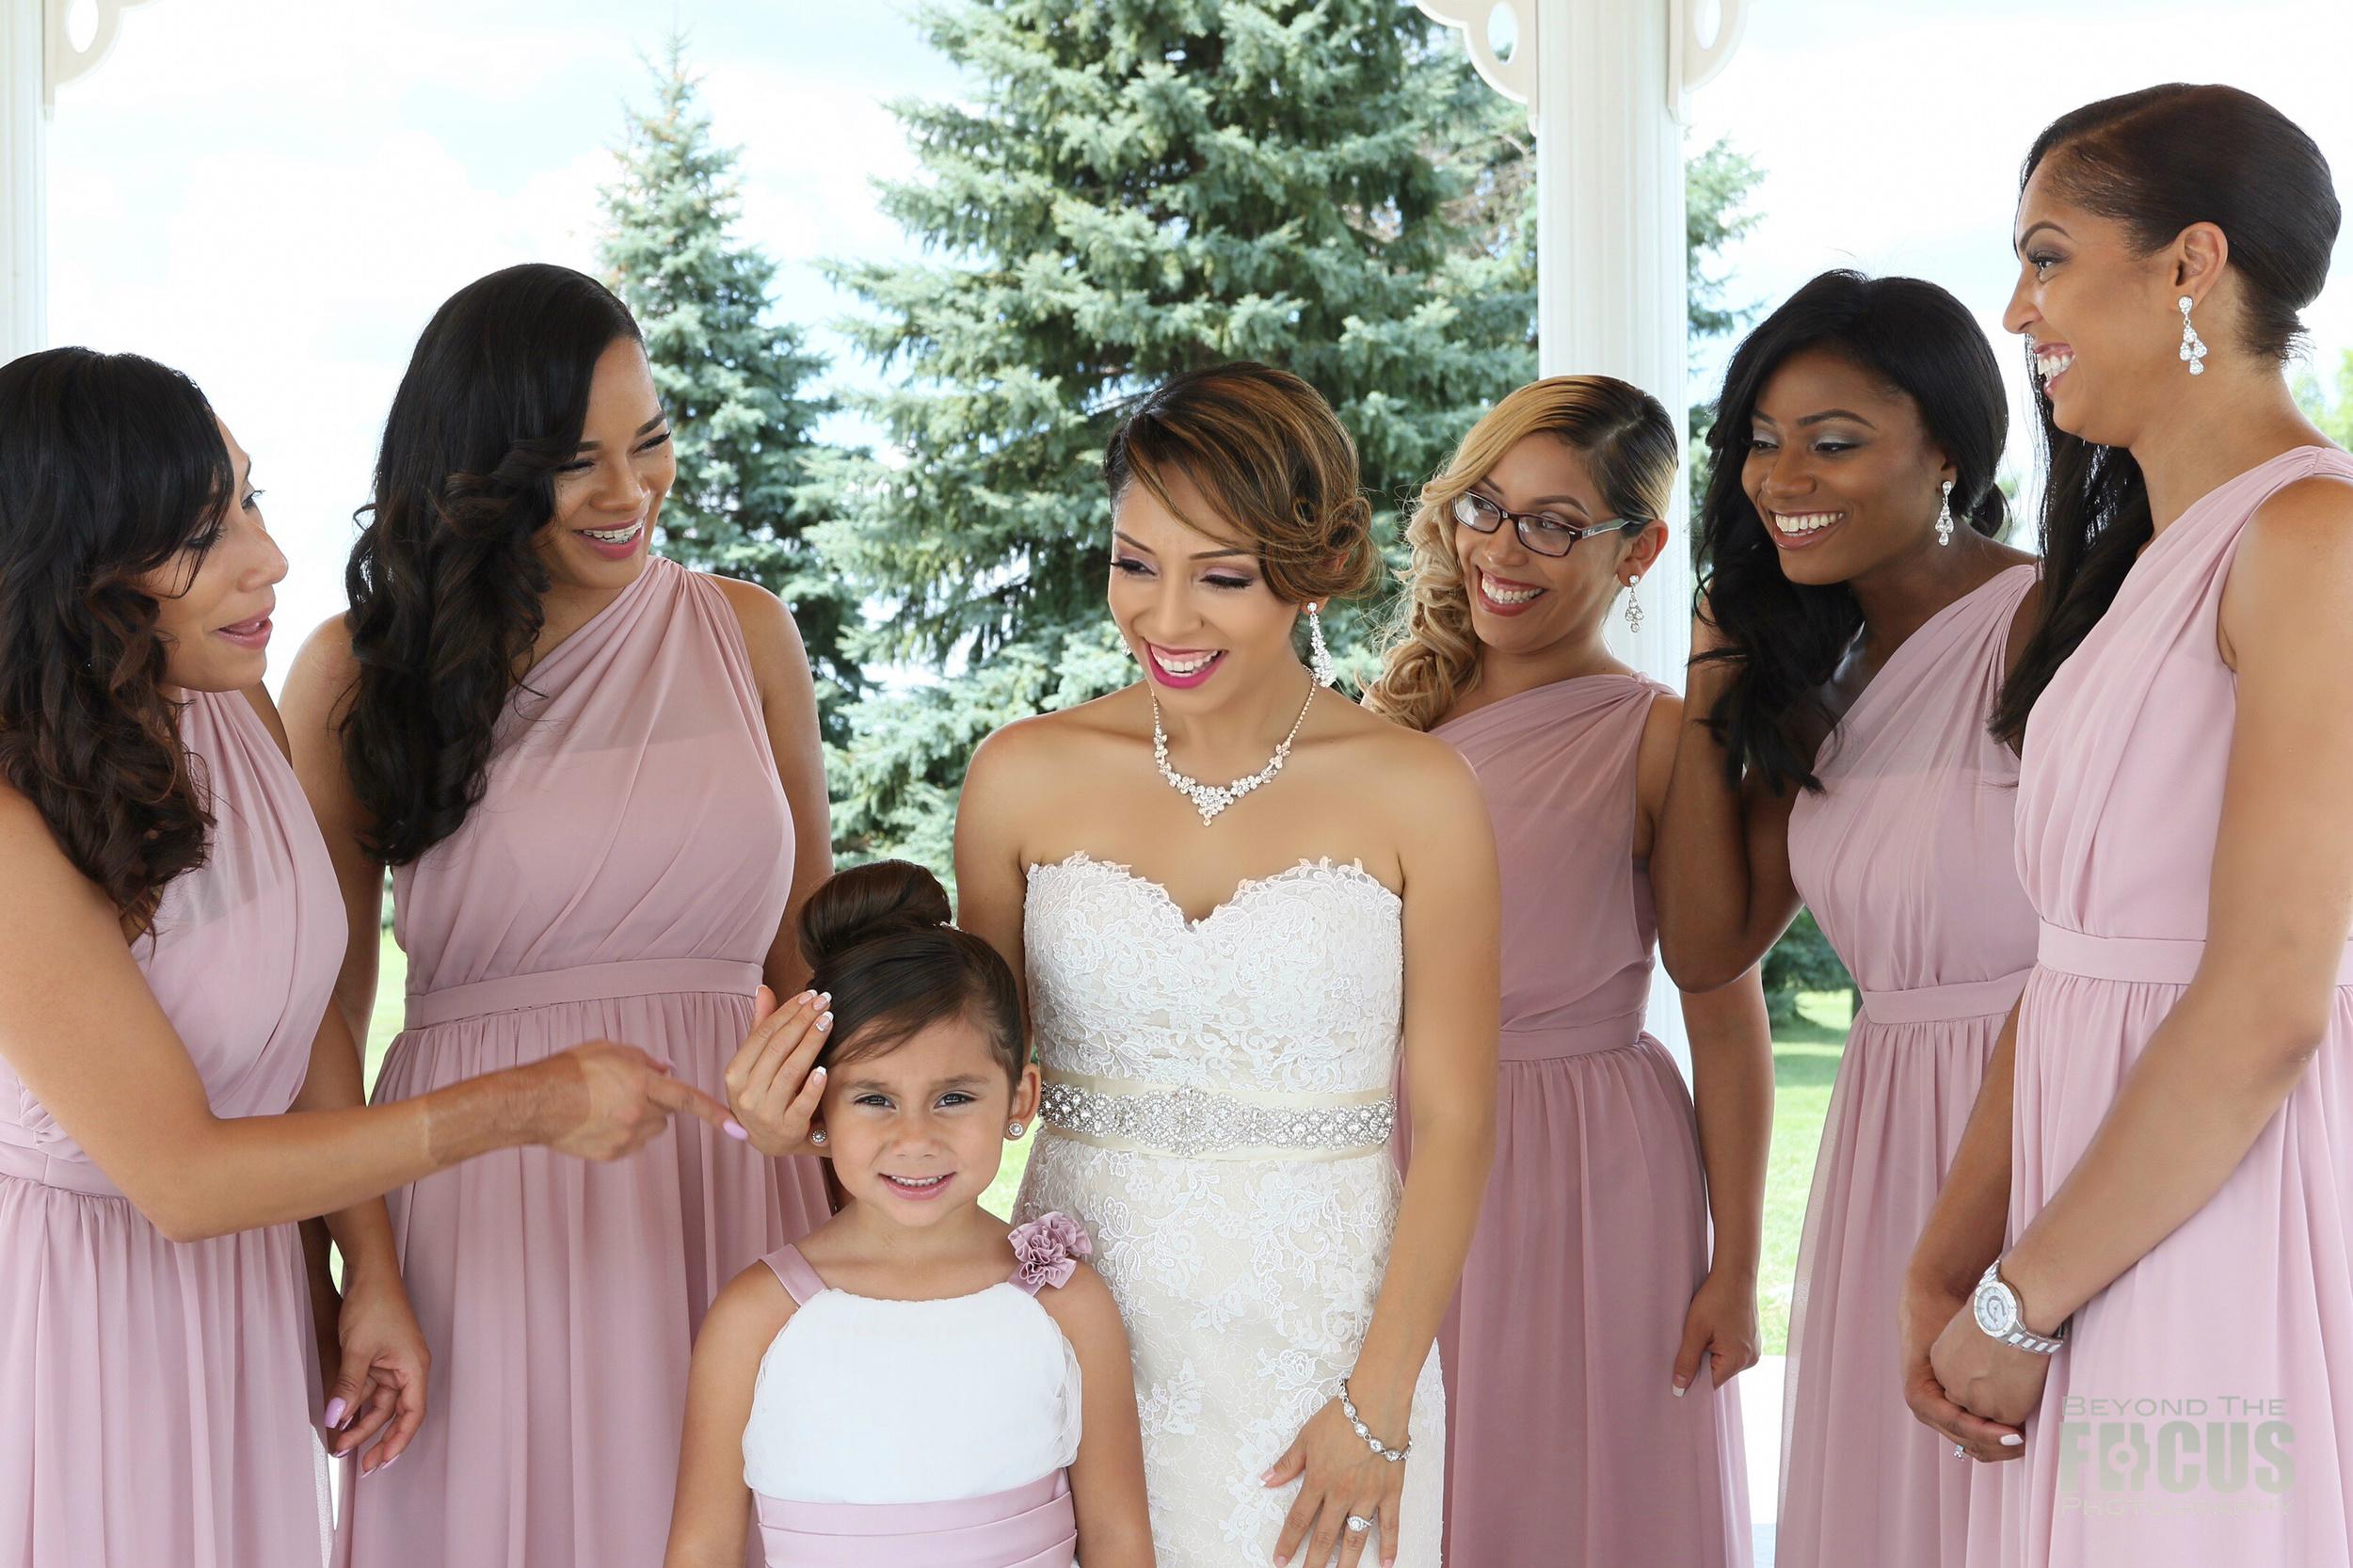 Palmer Wedding - Pre-Wedding Photos 32.jpg